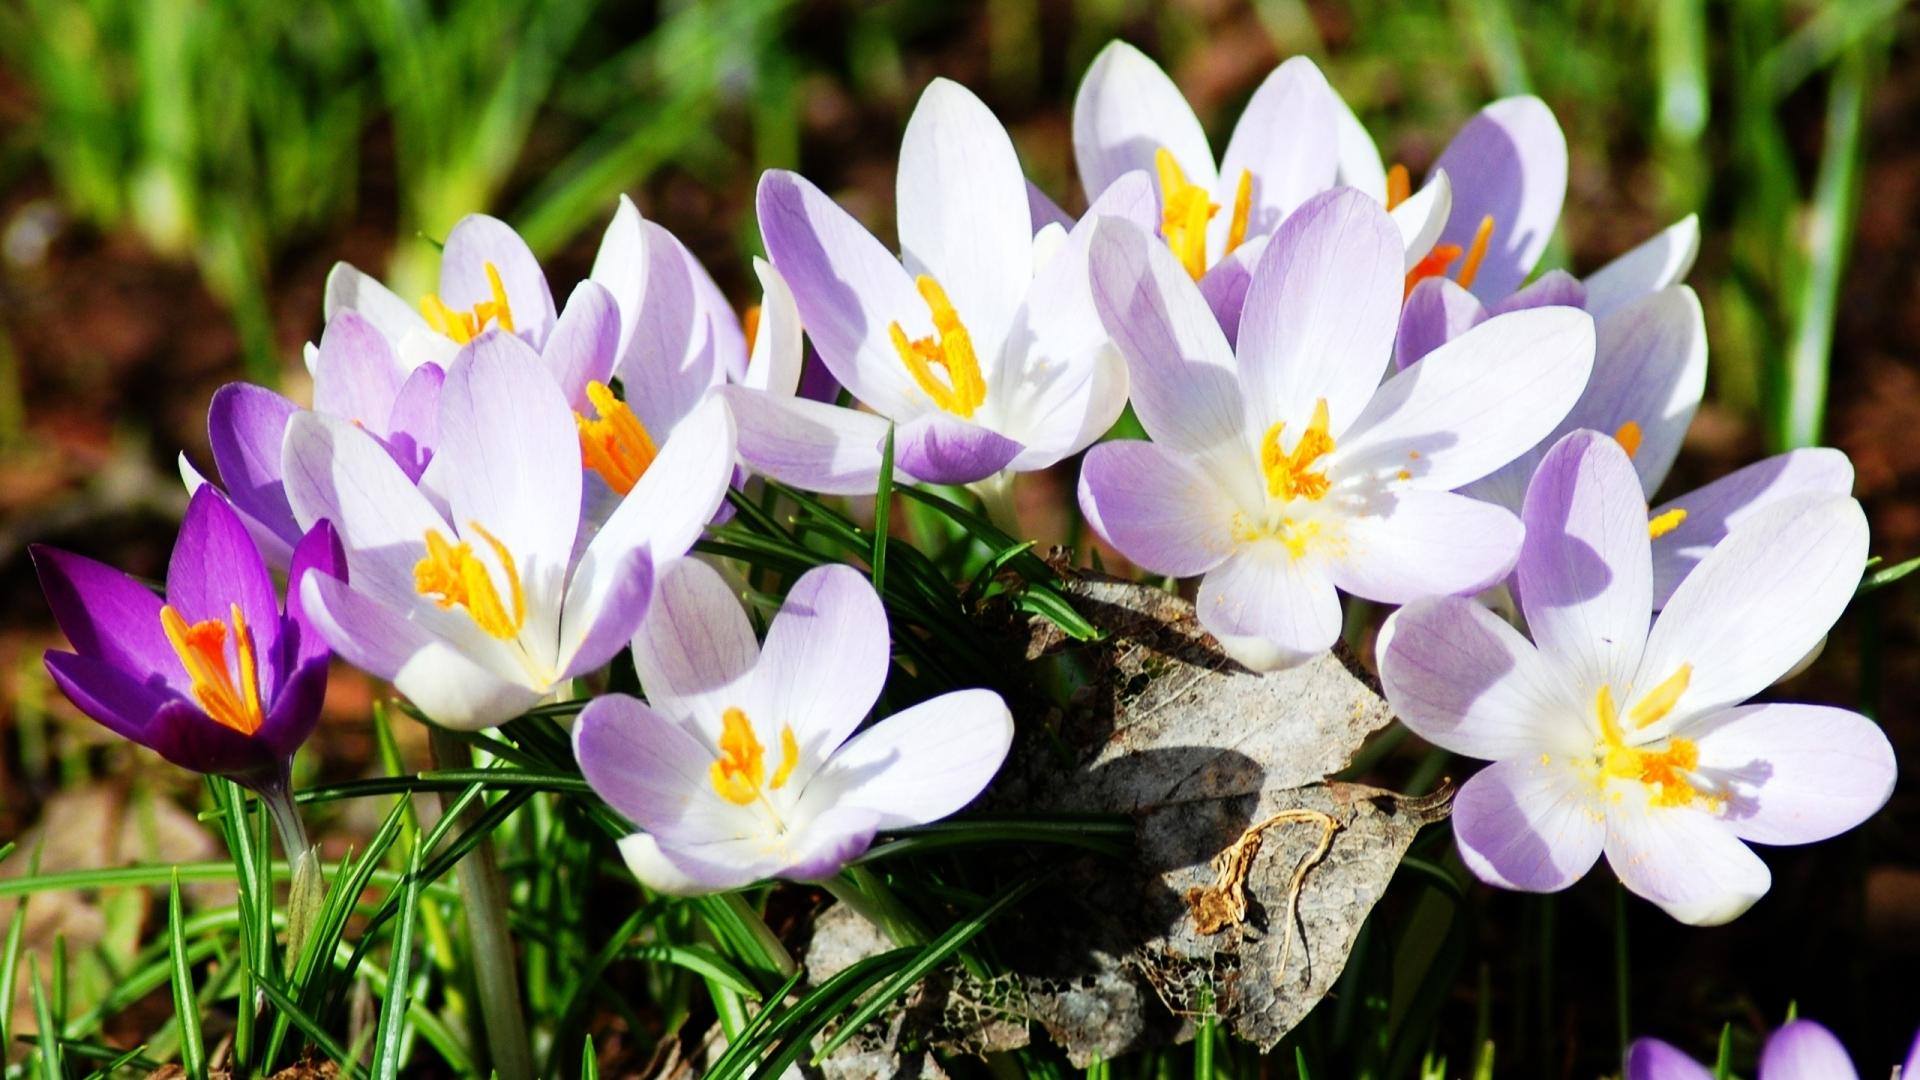 Картинки про весенние цветы